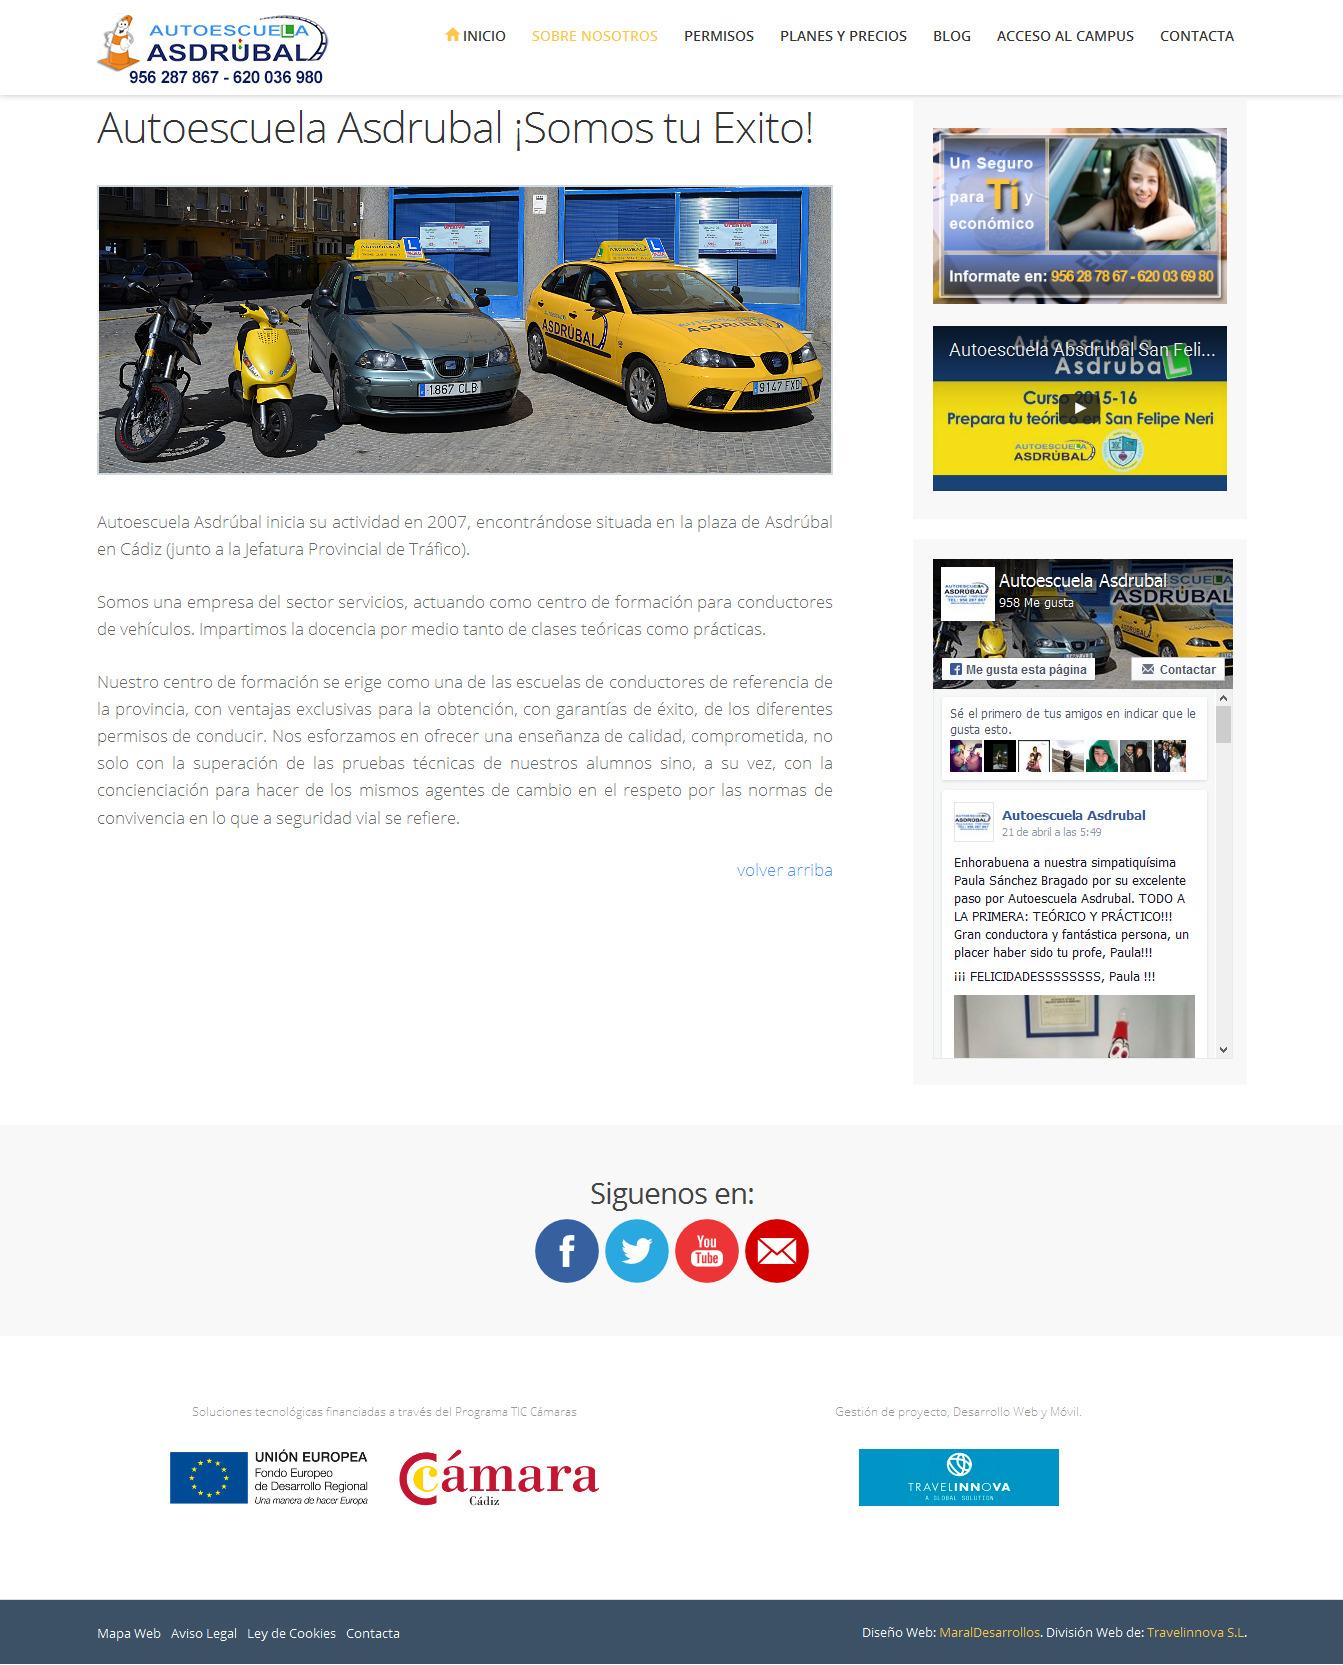 002-autoescuela-asadrubal-cadiz-nosotros